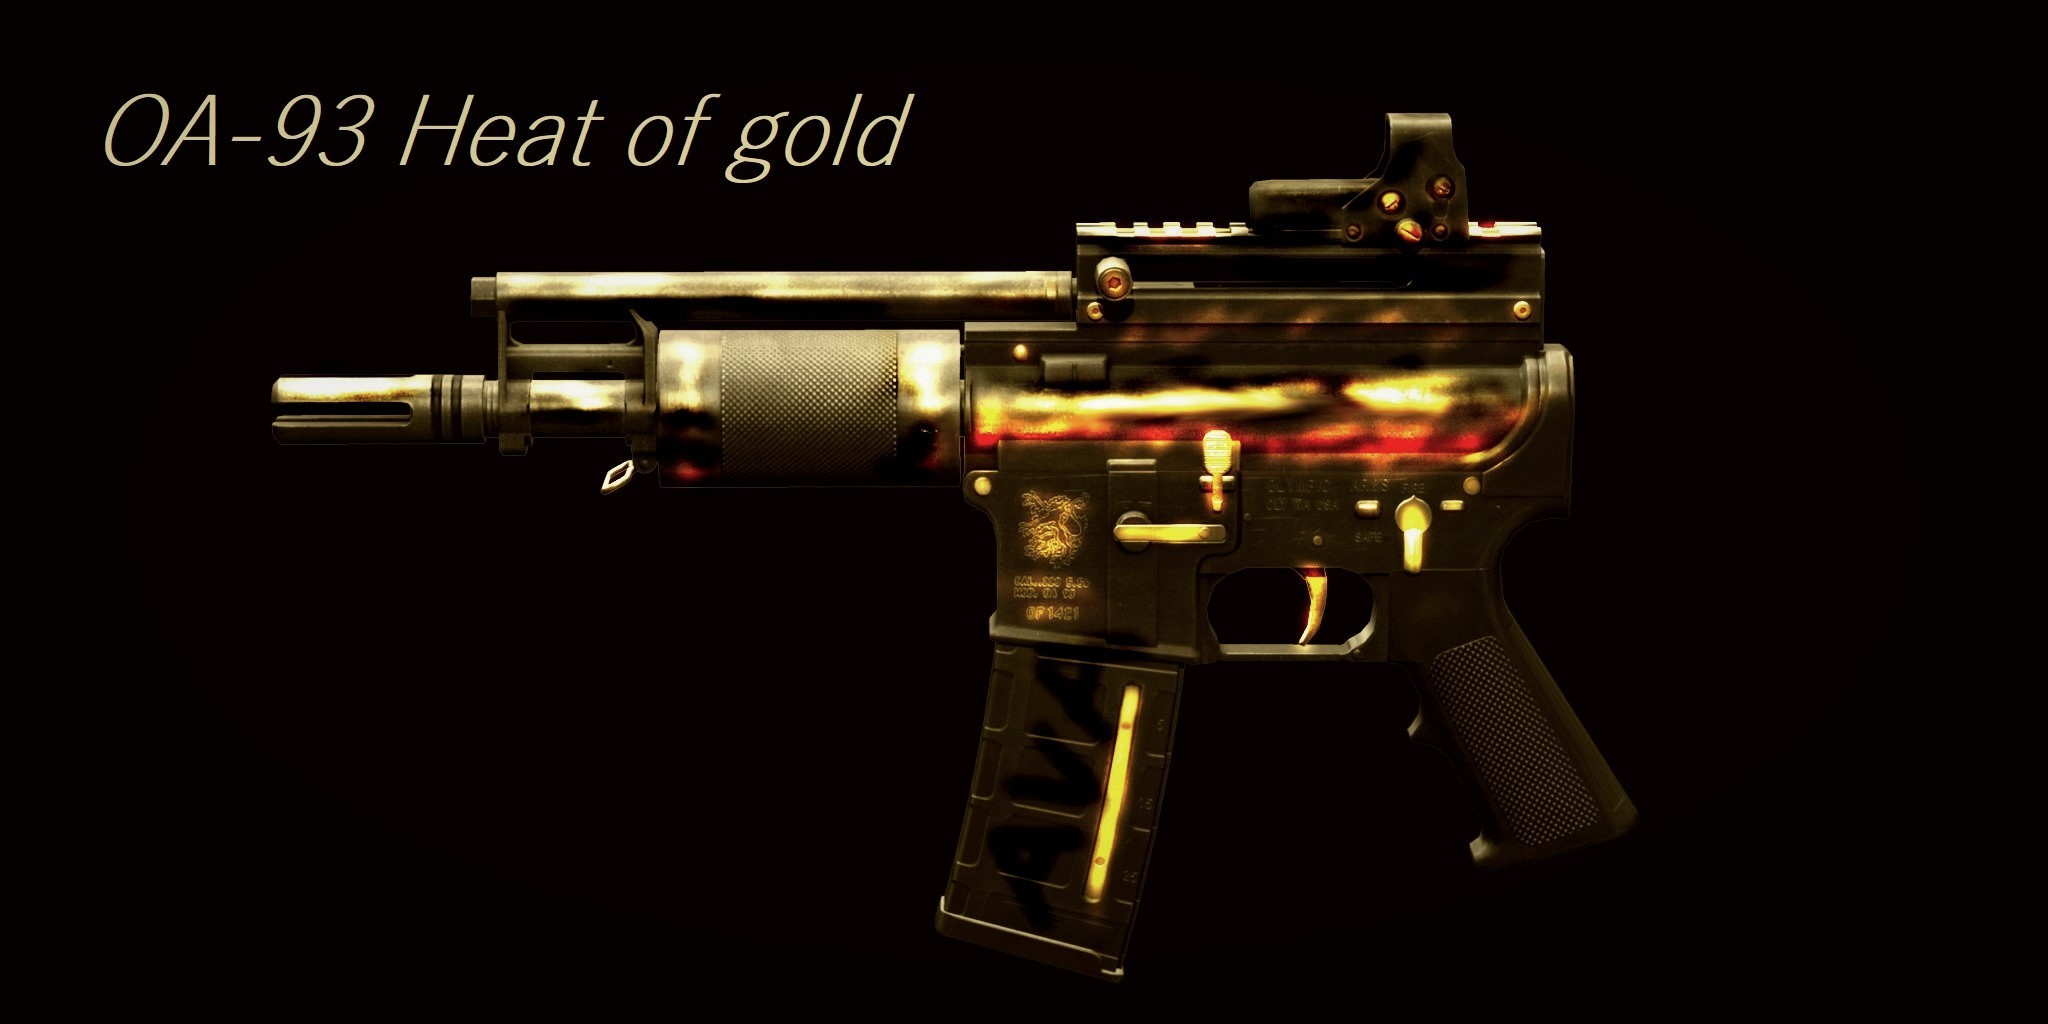 OA-93 Heat of gold